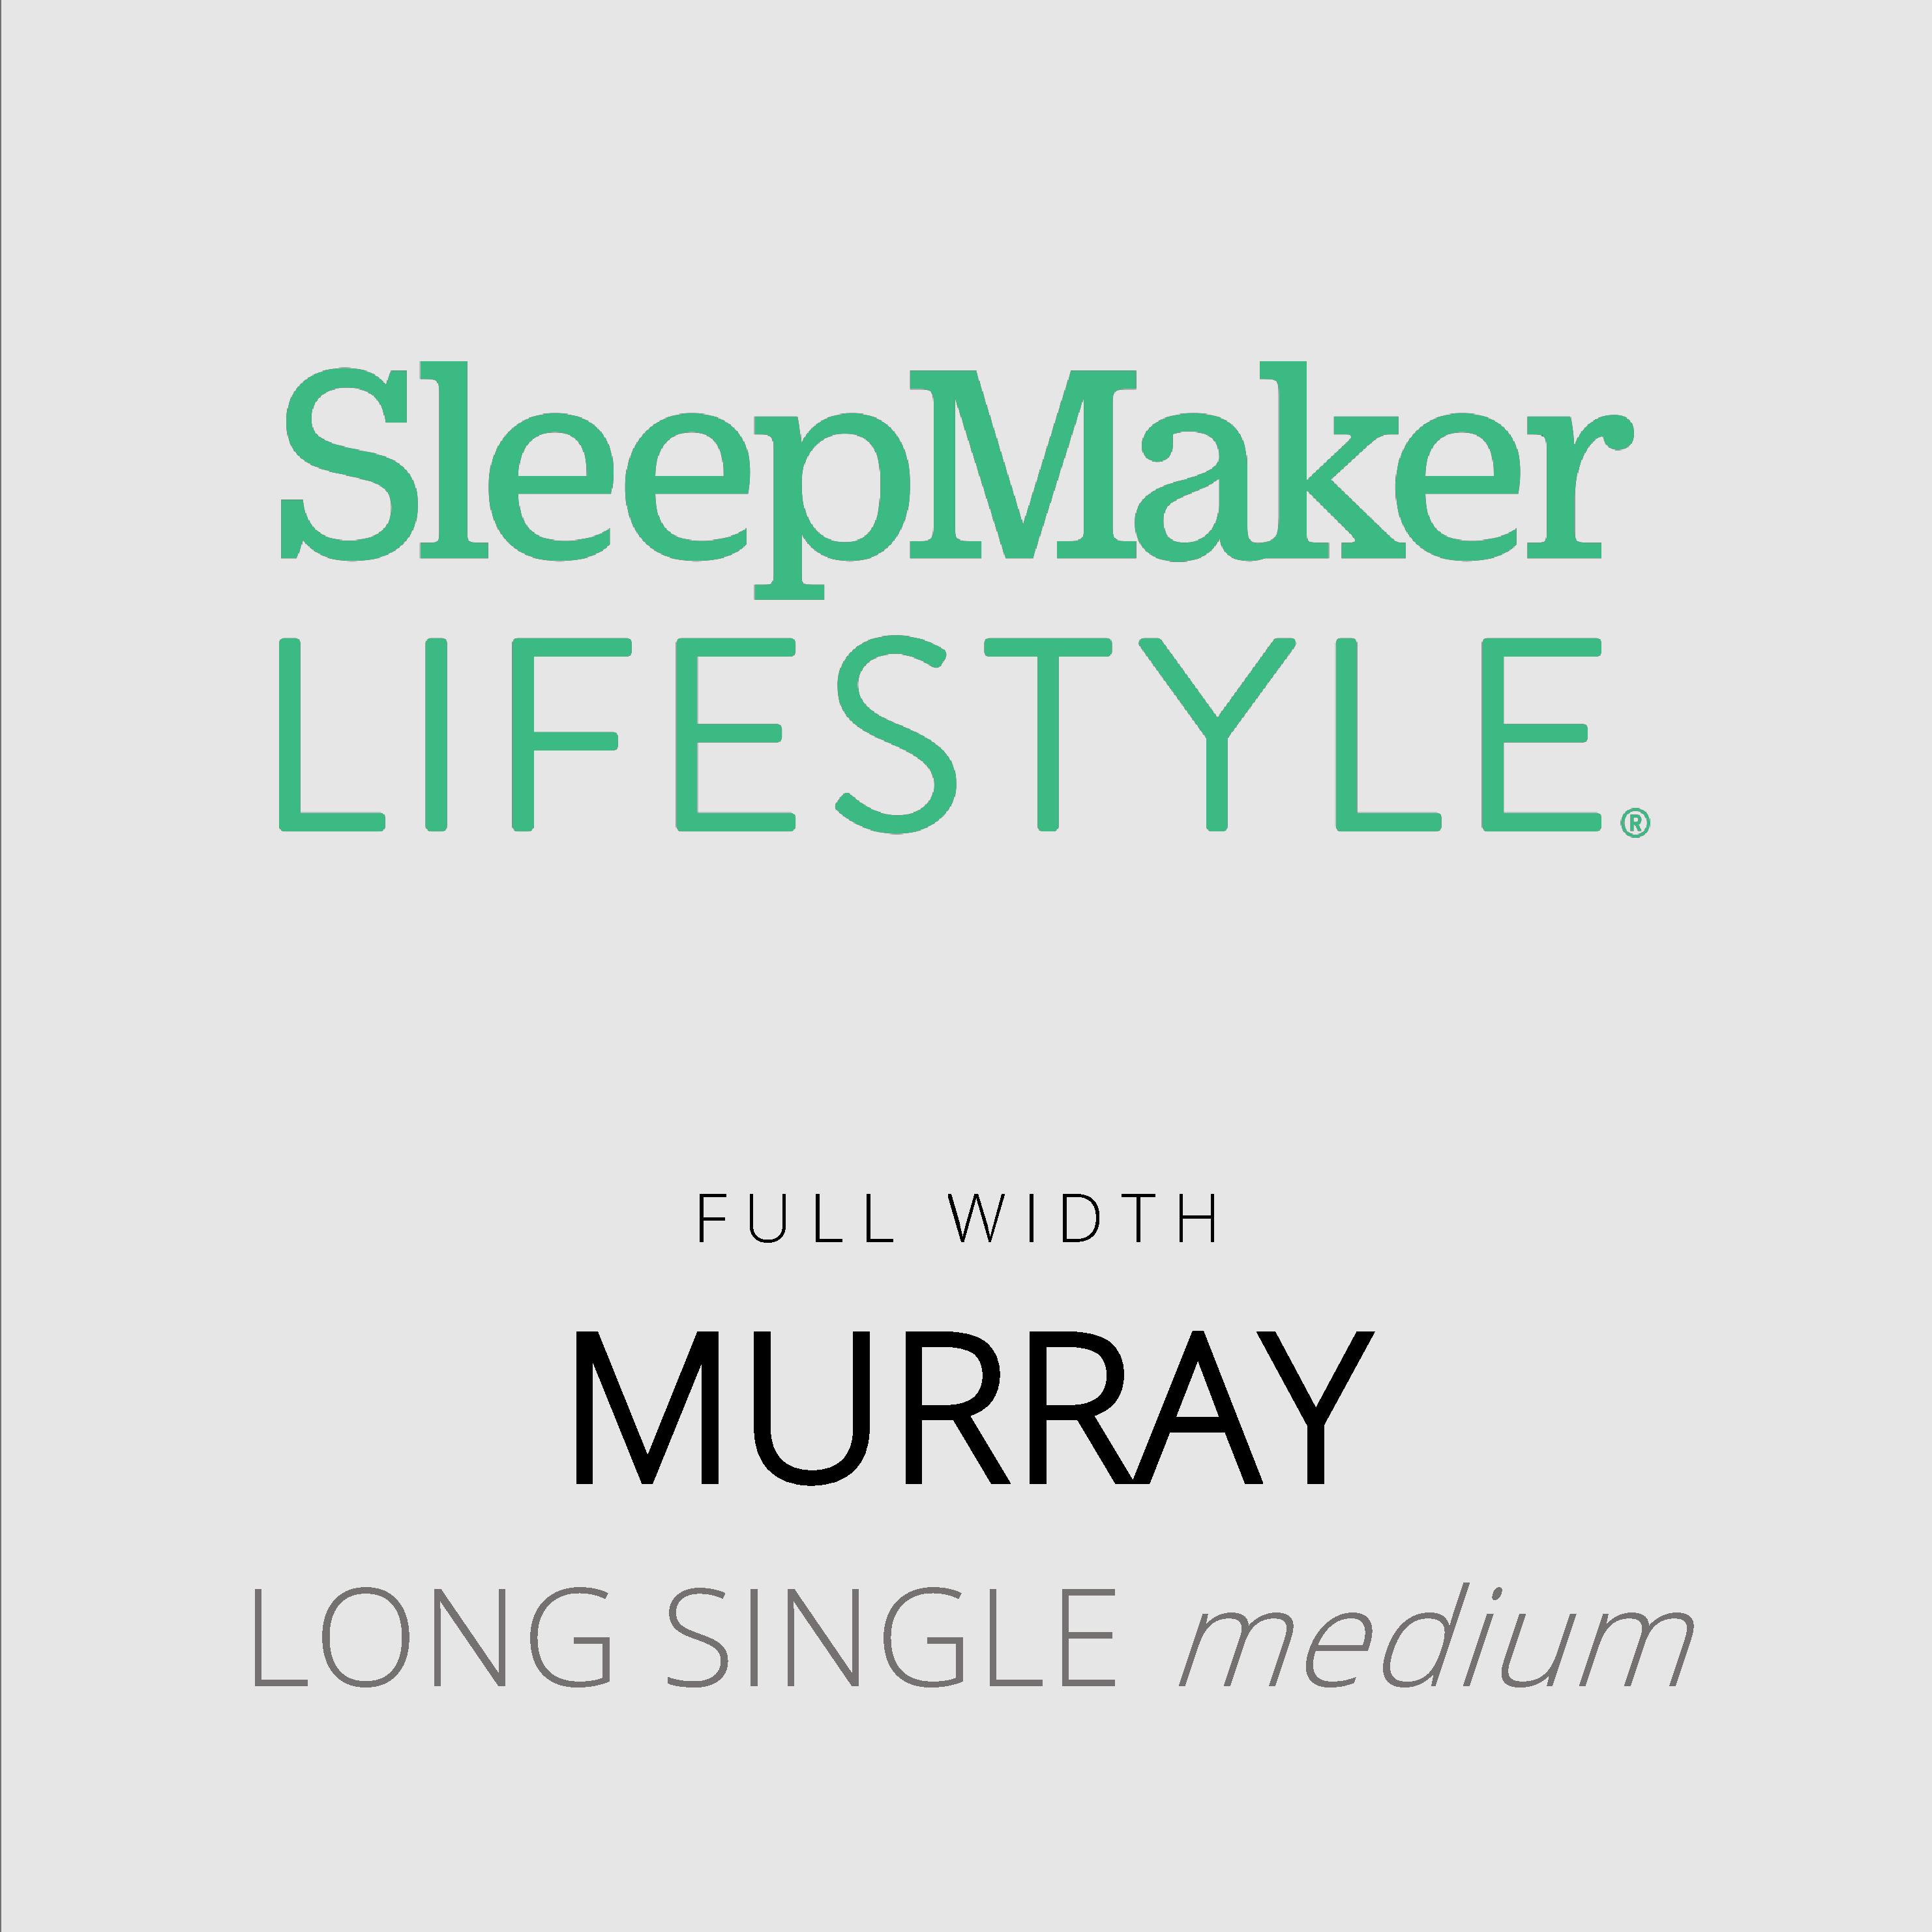 SleepMaker Lifestyle – Murray – Full Width – Long Single Medium Mattress